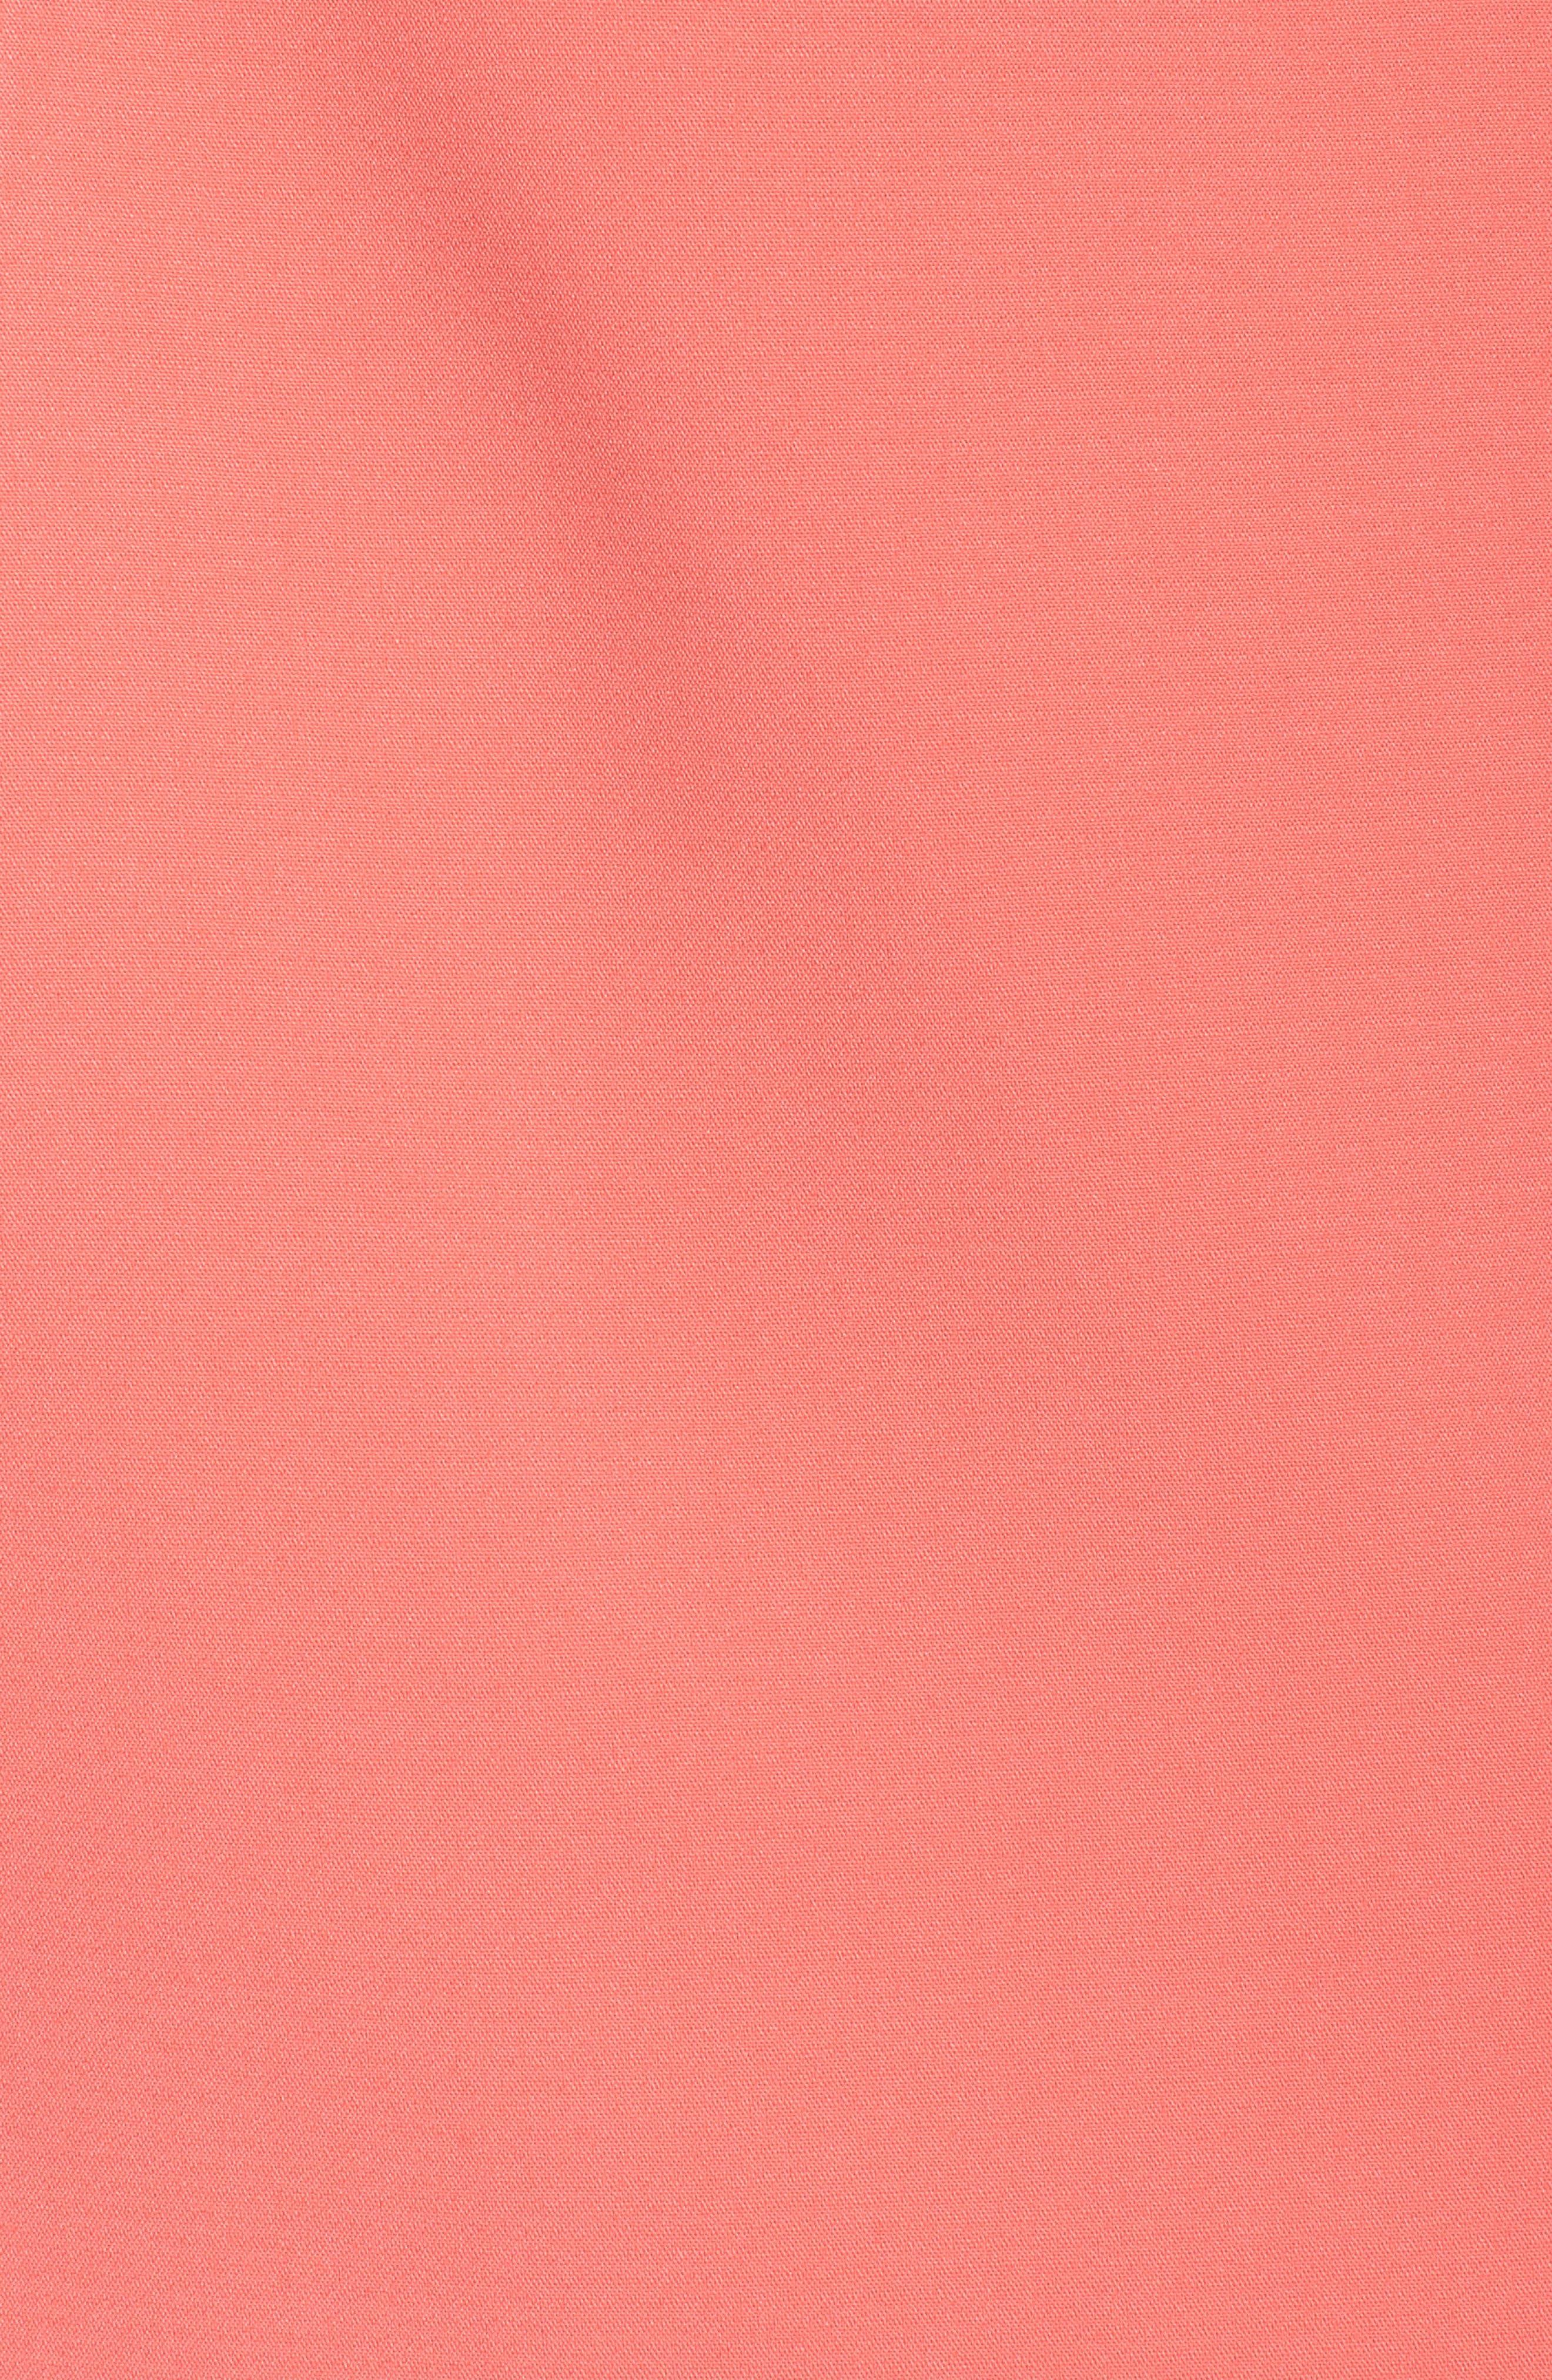 Harper Knotted Strapless Minidress,                             Alternate thumbnail 6, color,                             Coral